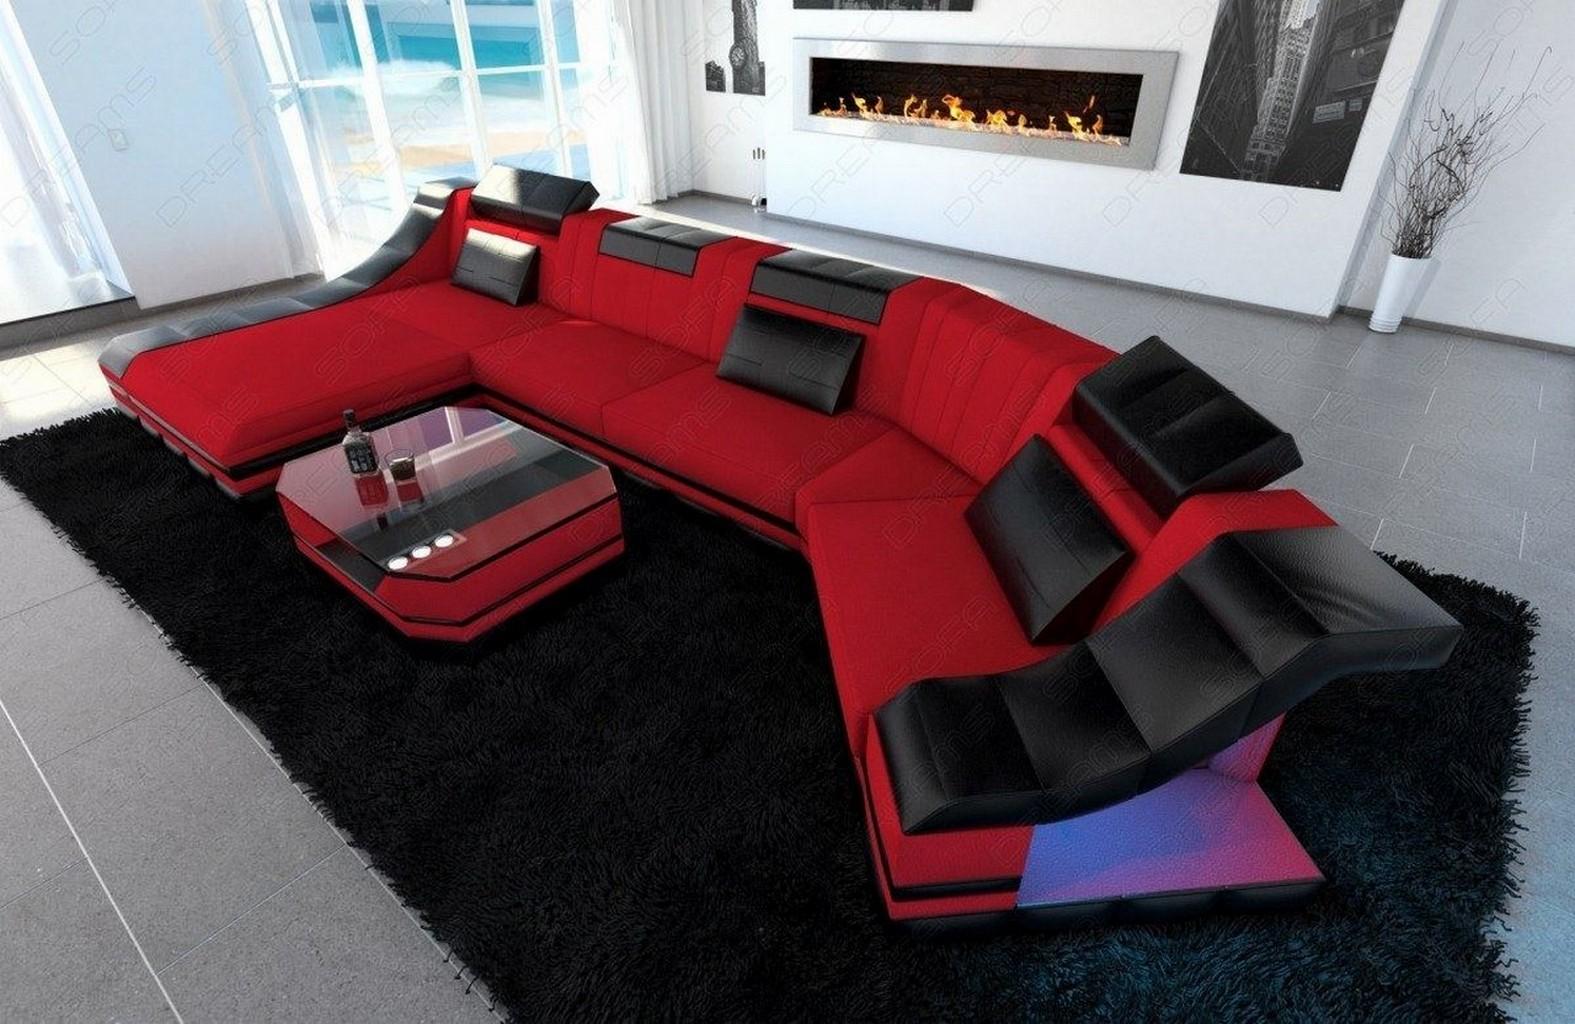 dunkle pigmentflecken bauch rechts. Black Bedroom Furniture Sets. Home Design Ideas